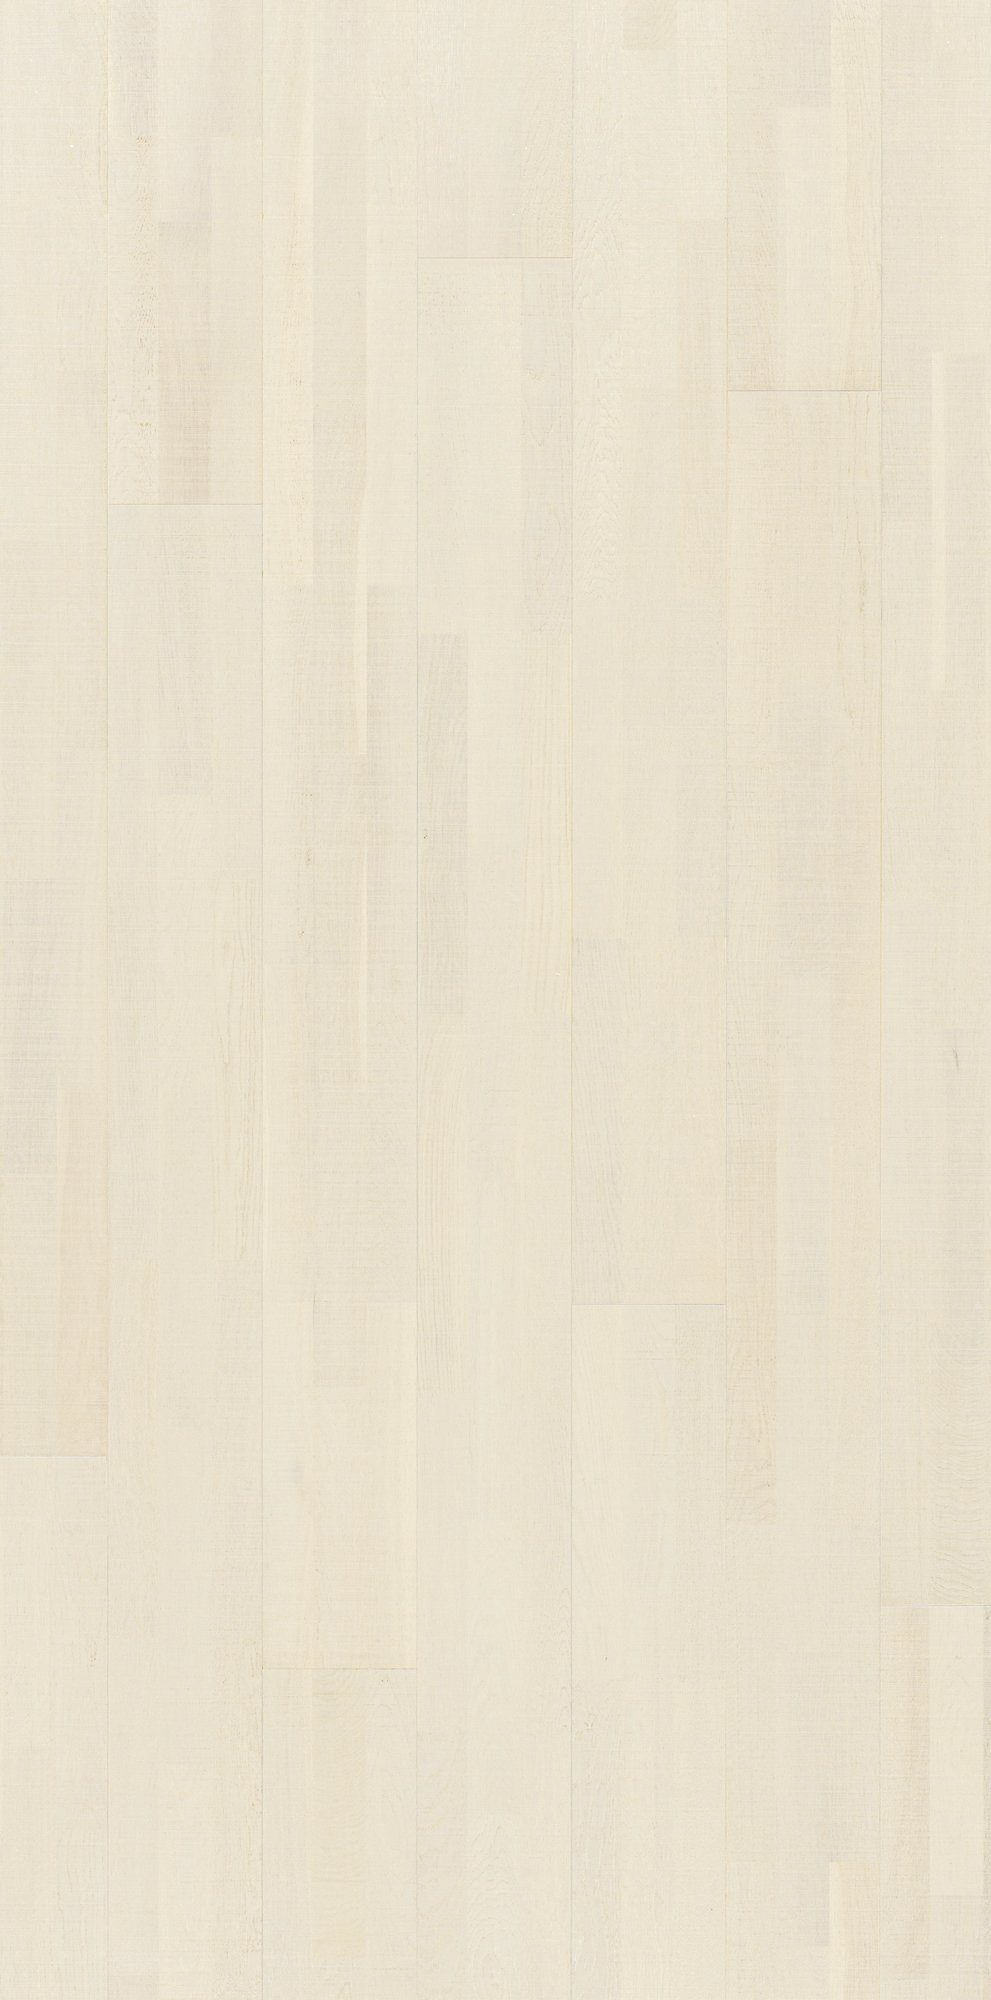 PARADOR Parkett »Trendtime 6 Living - Eiche perlmutt«, 2200 x 185 mm, Stärke: 13 mm, 3,66 m²